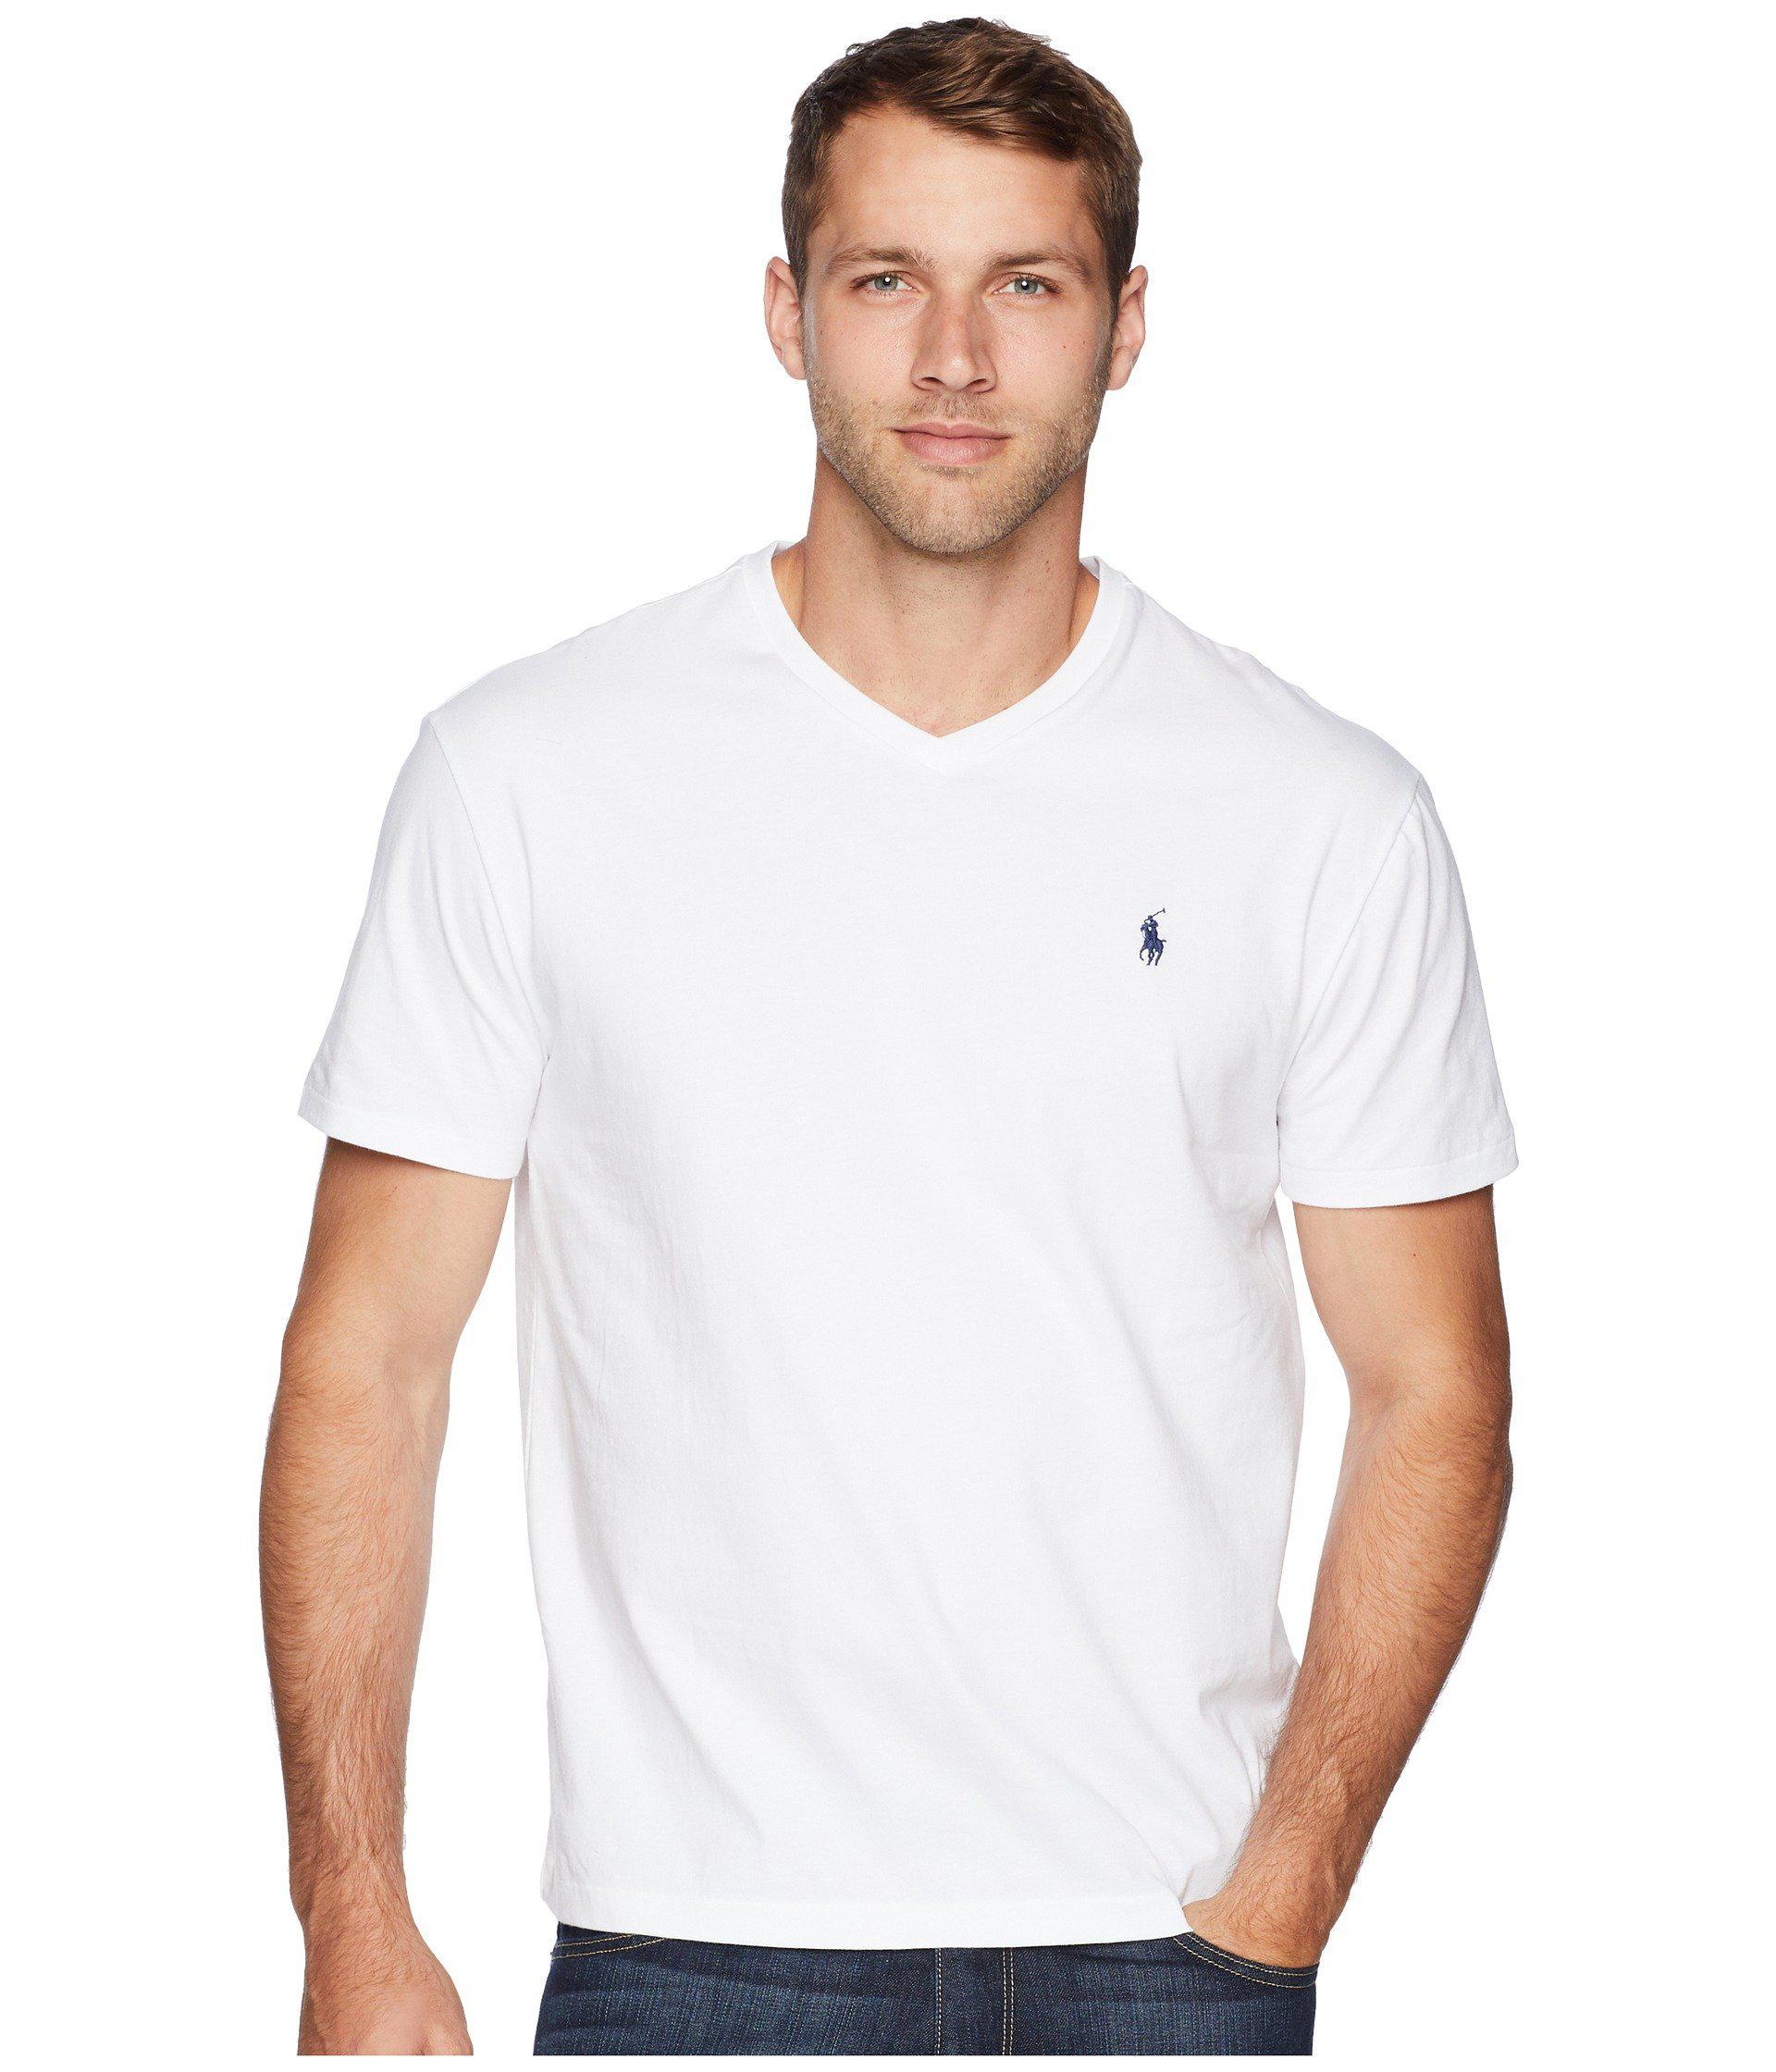 bd4eaf007e Men's White Classic V-neck T-shirt